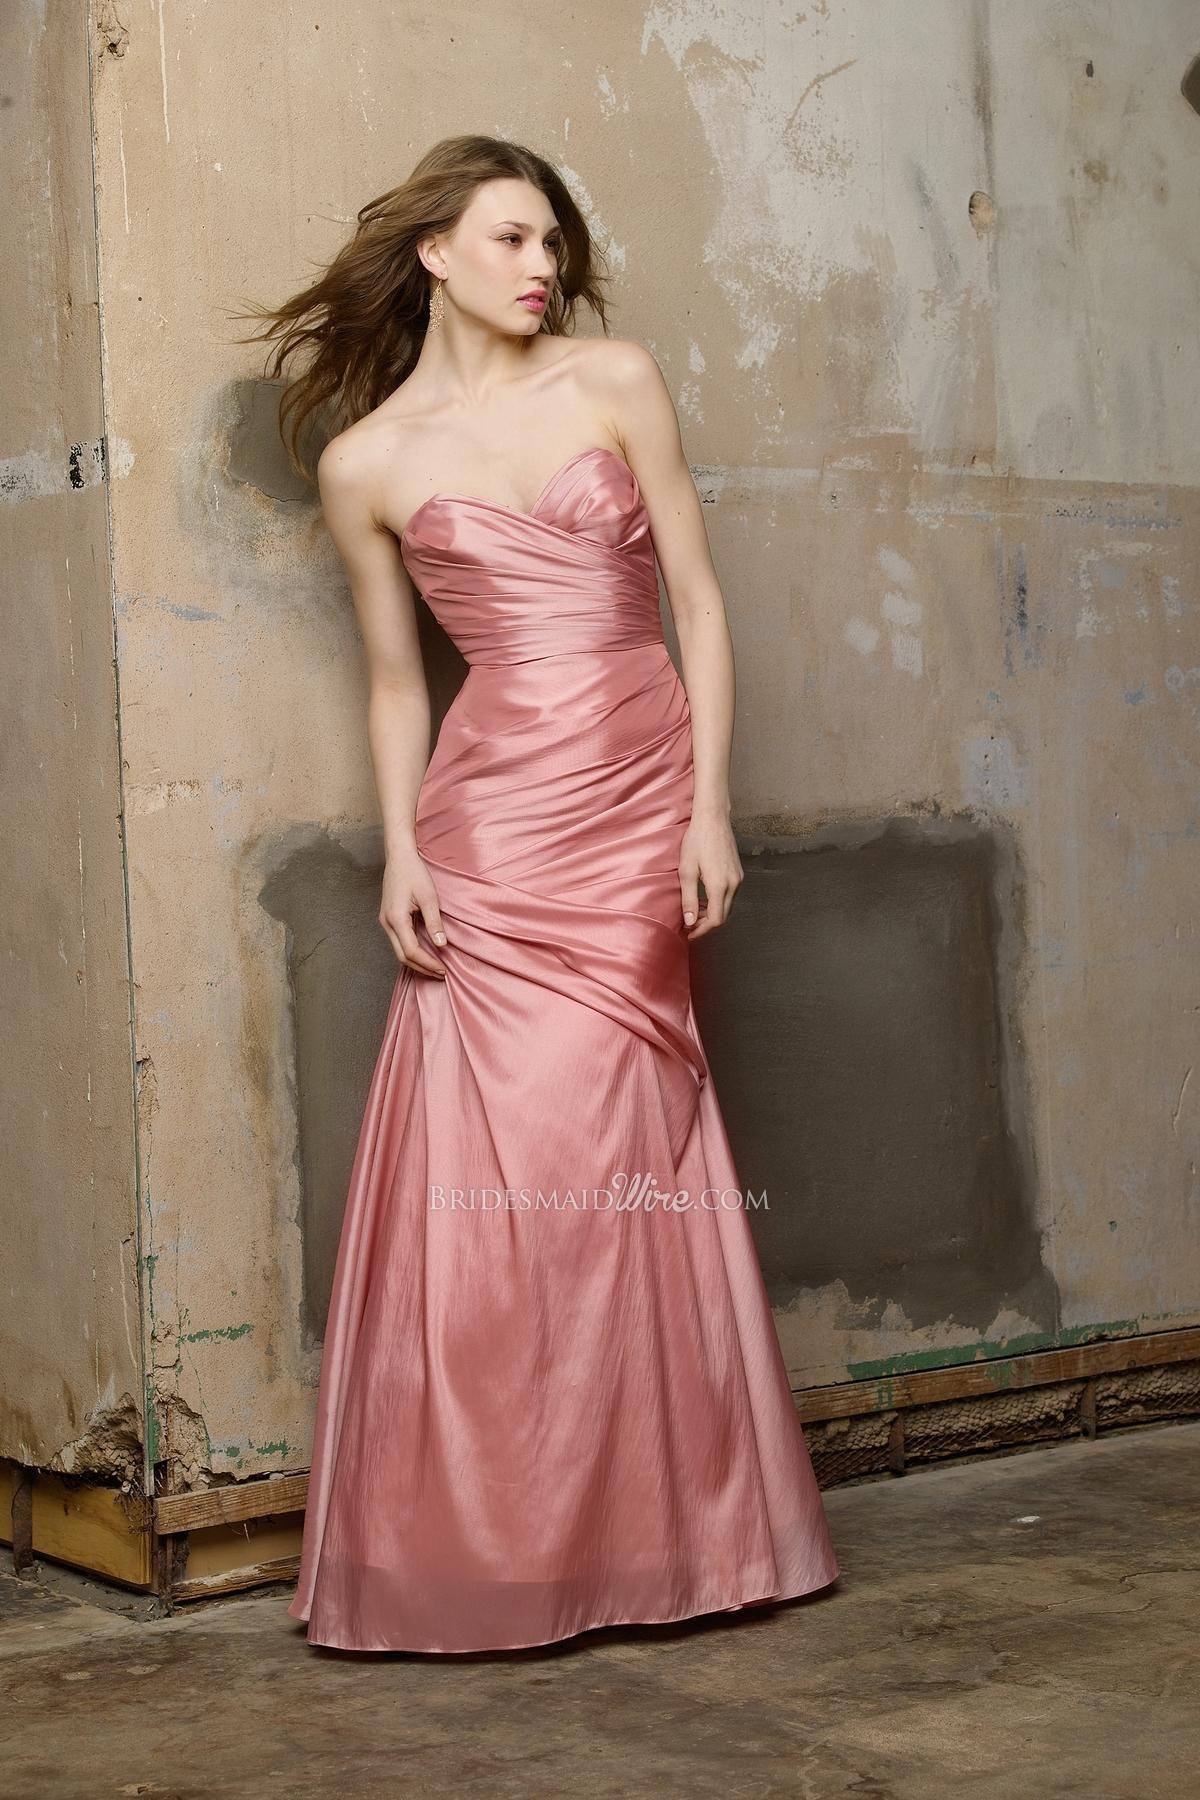 frosting taffeta strapless trumpet floor length formal dress | style ...